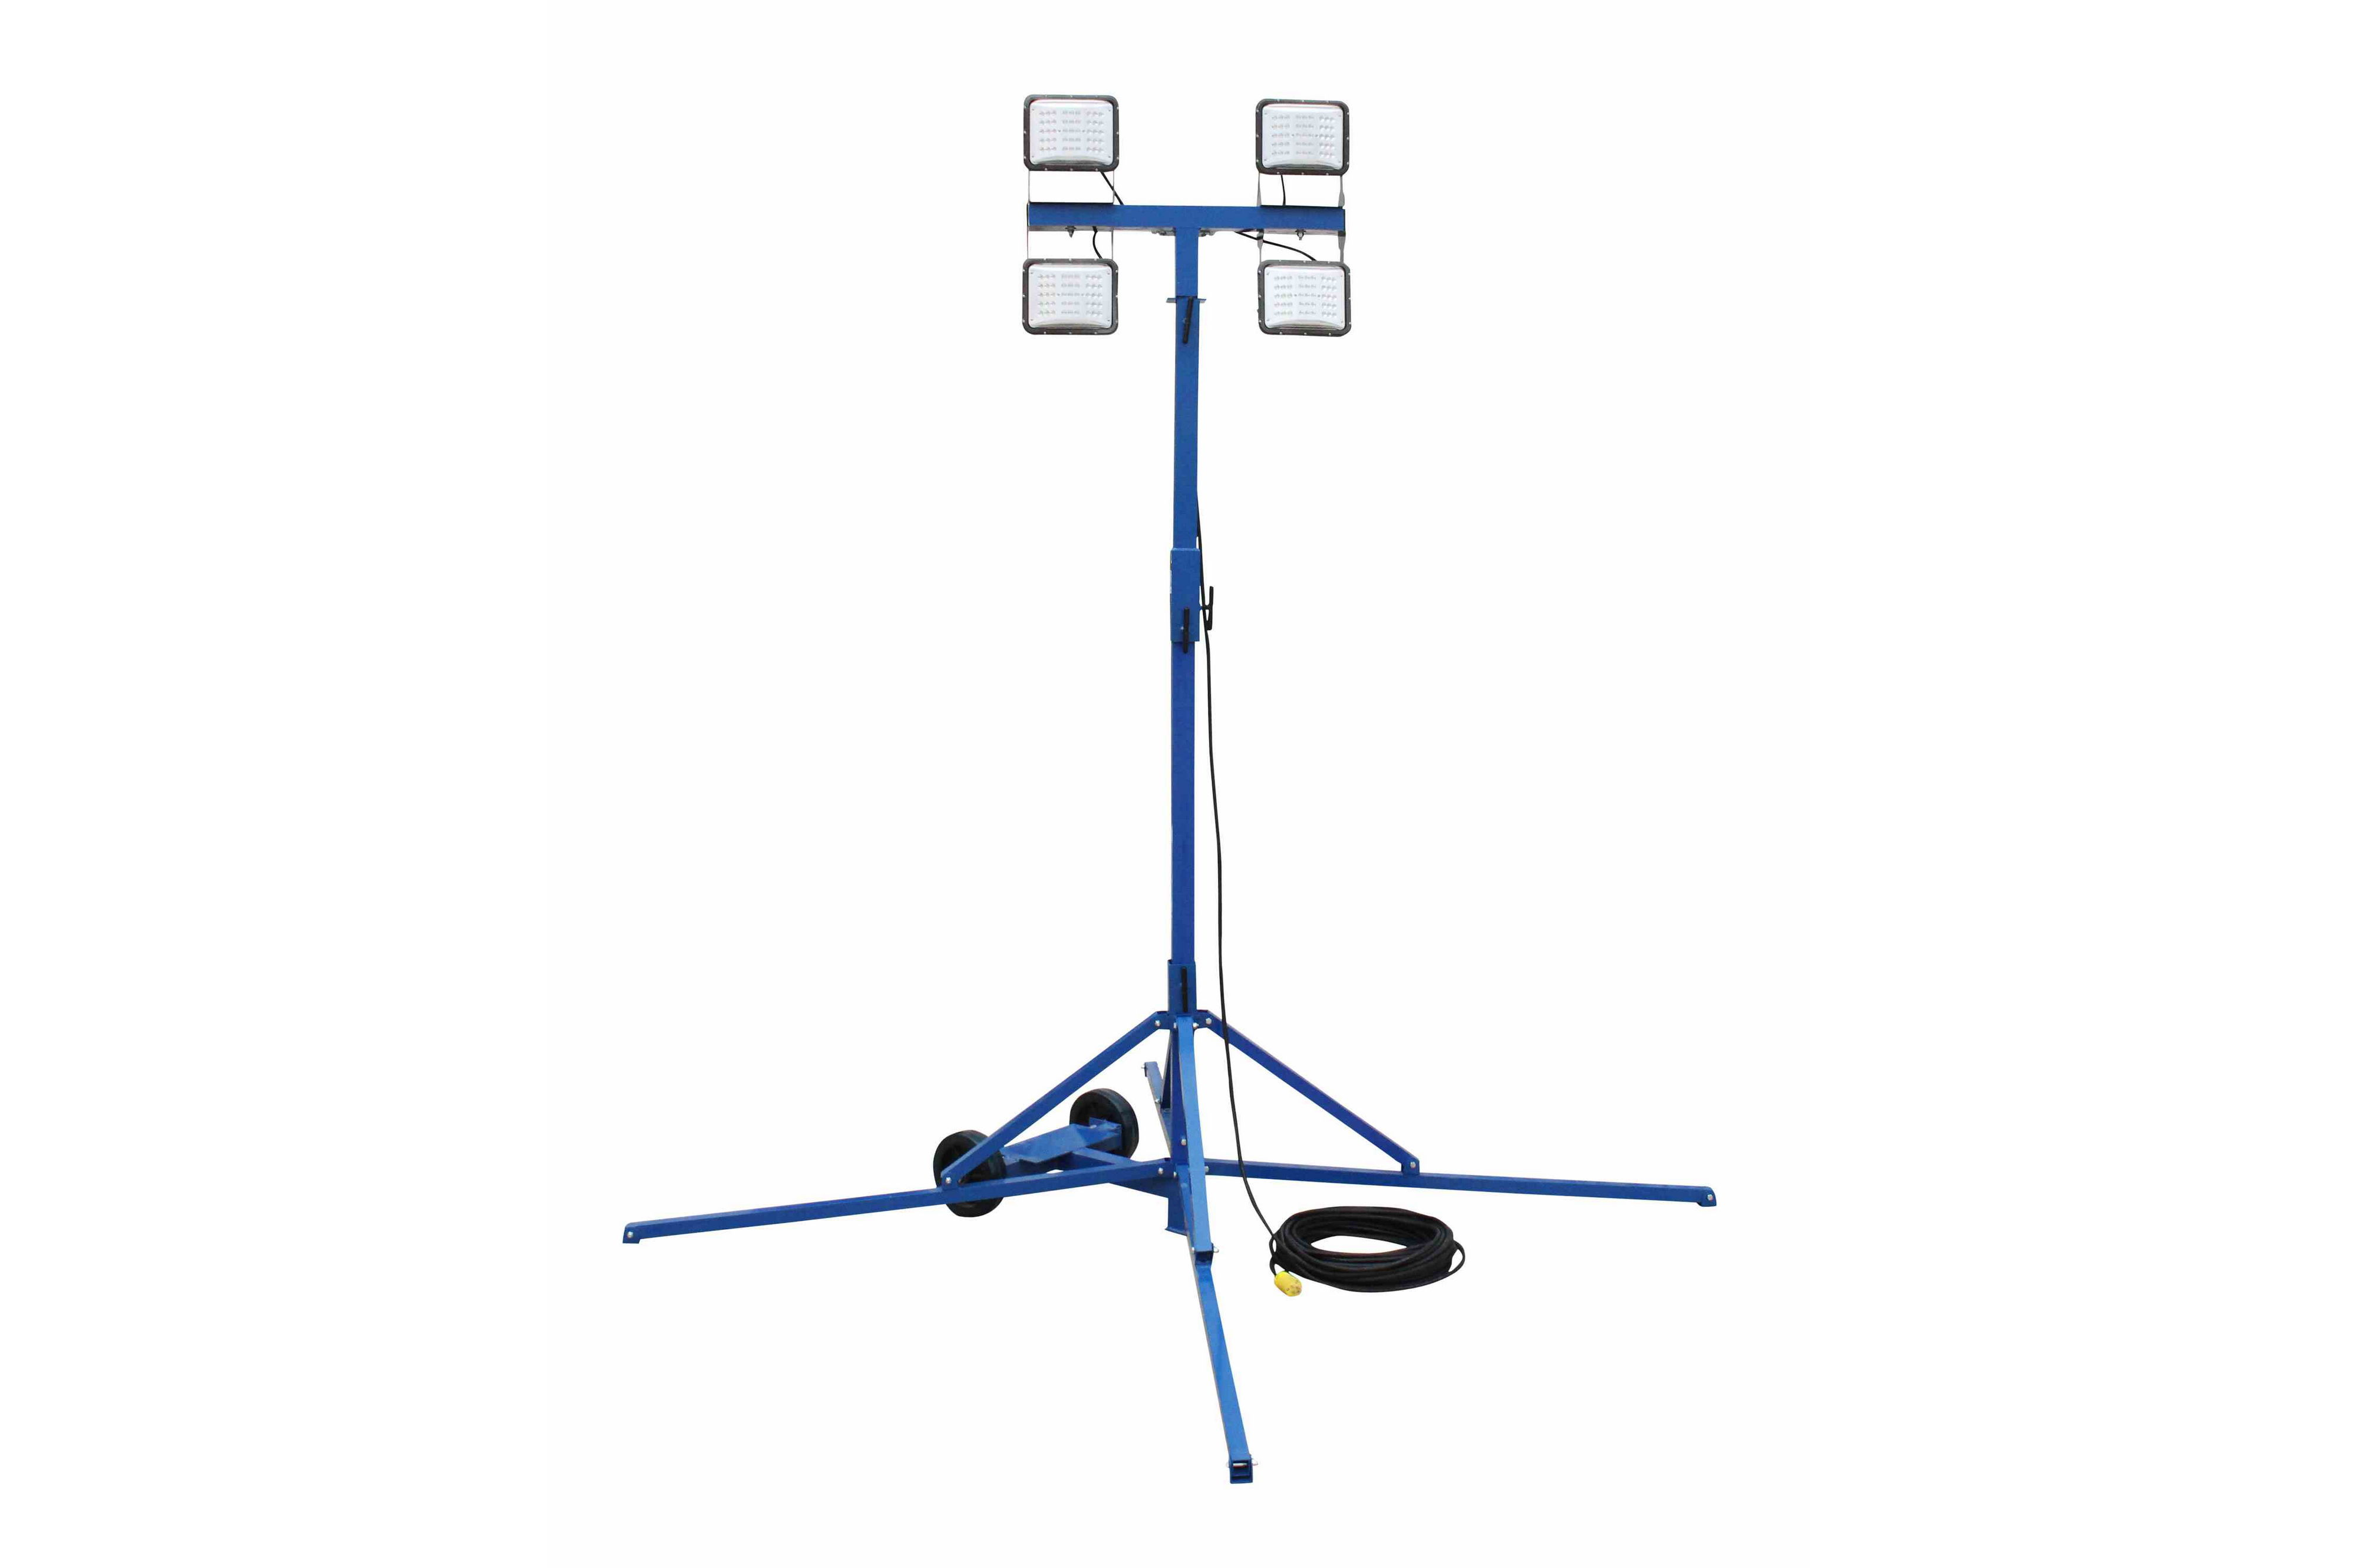 240 Watt Led Work Area Quadpod Light Fixture